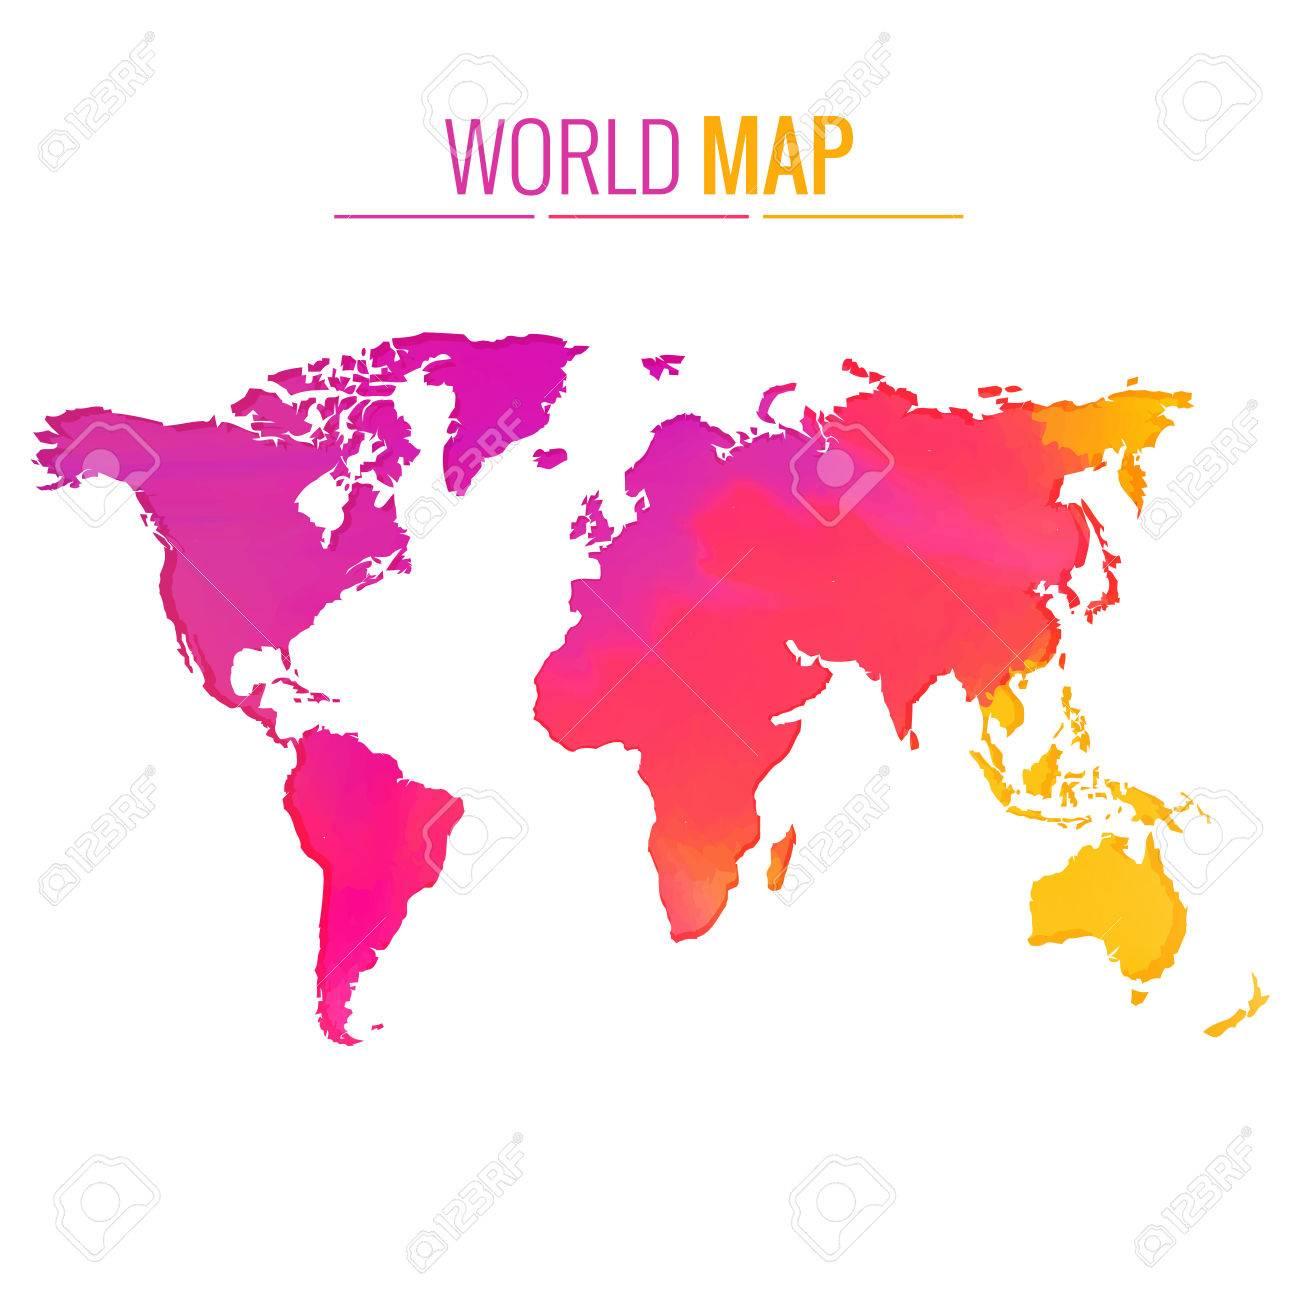 Colorful world map vector design illustration royalty free cliparts colorful world map vector design illustration stock vector 39244624 gumiabroncs Gallery